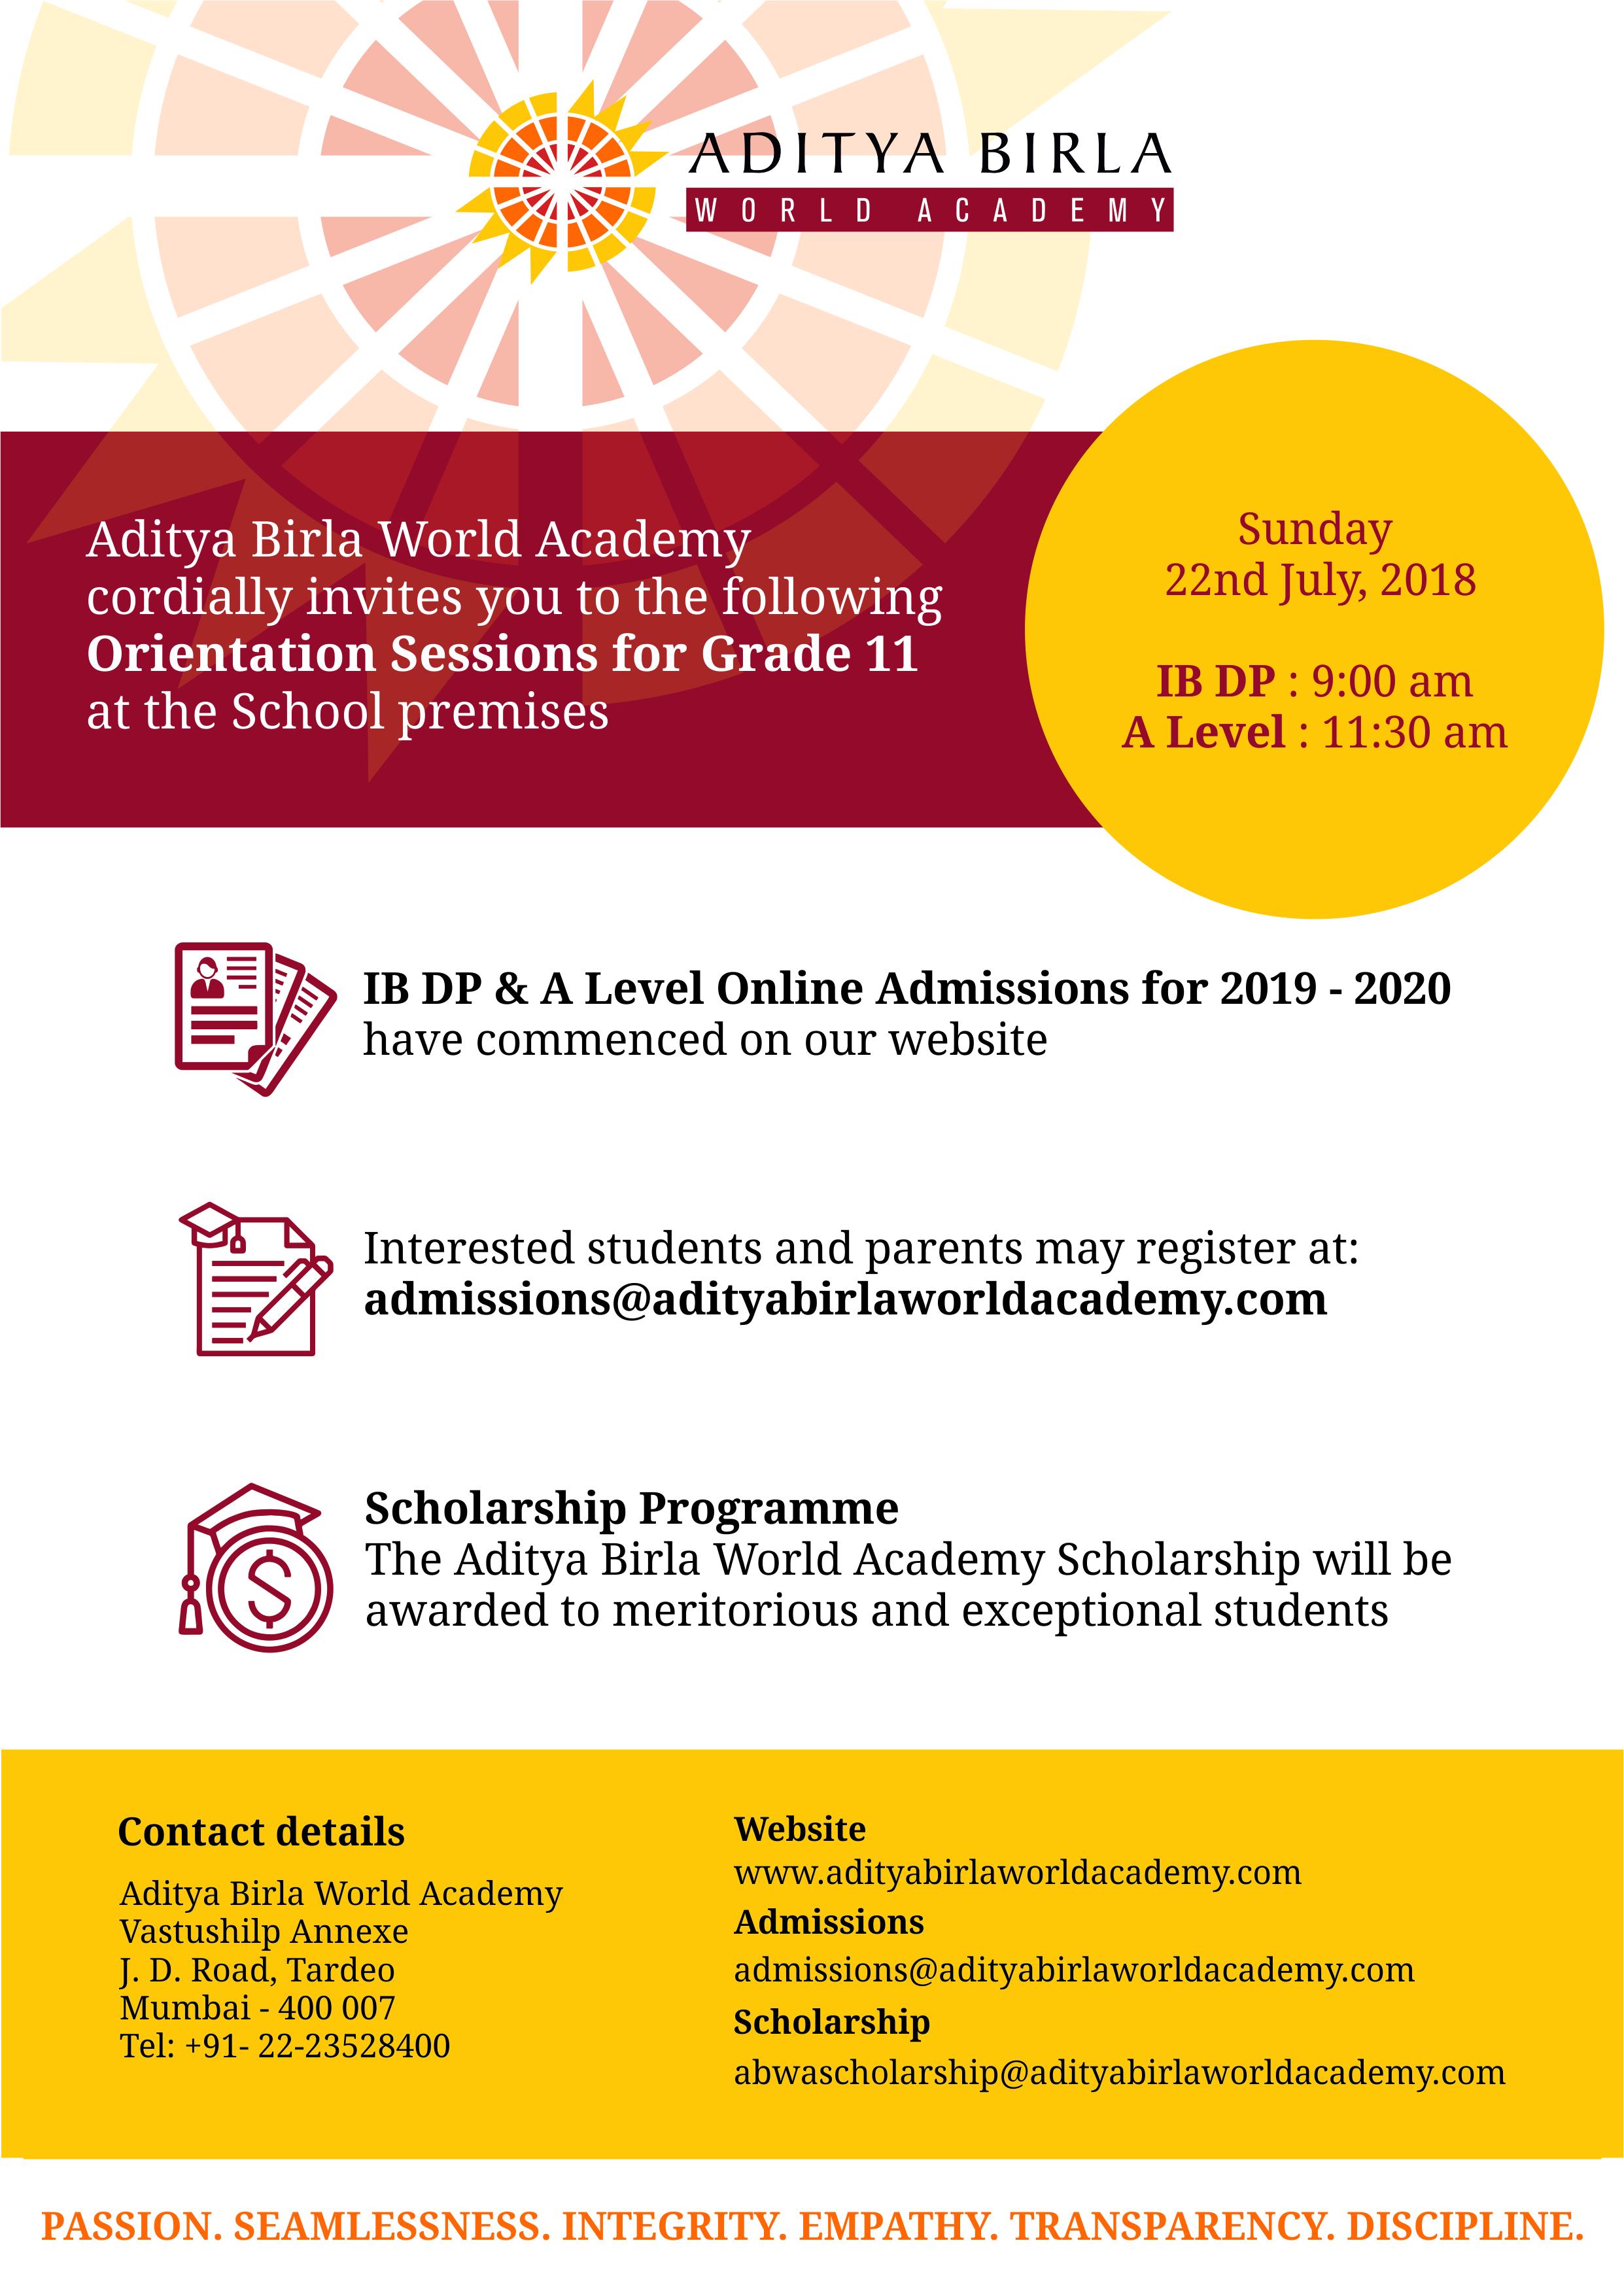 Aditya Birla World Academy admission 2018